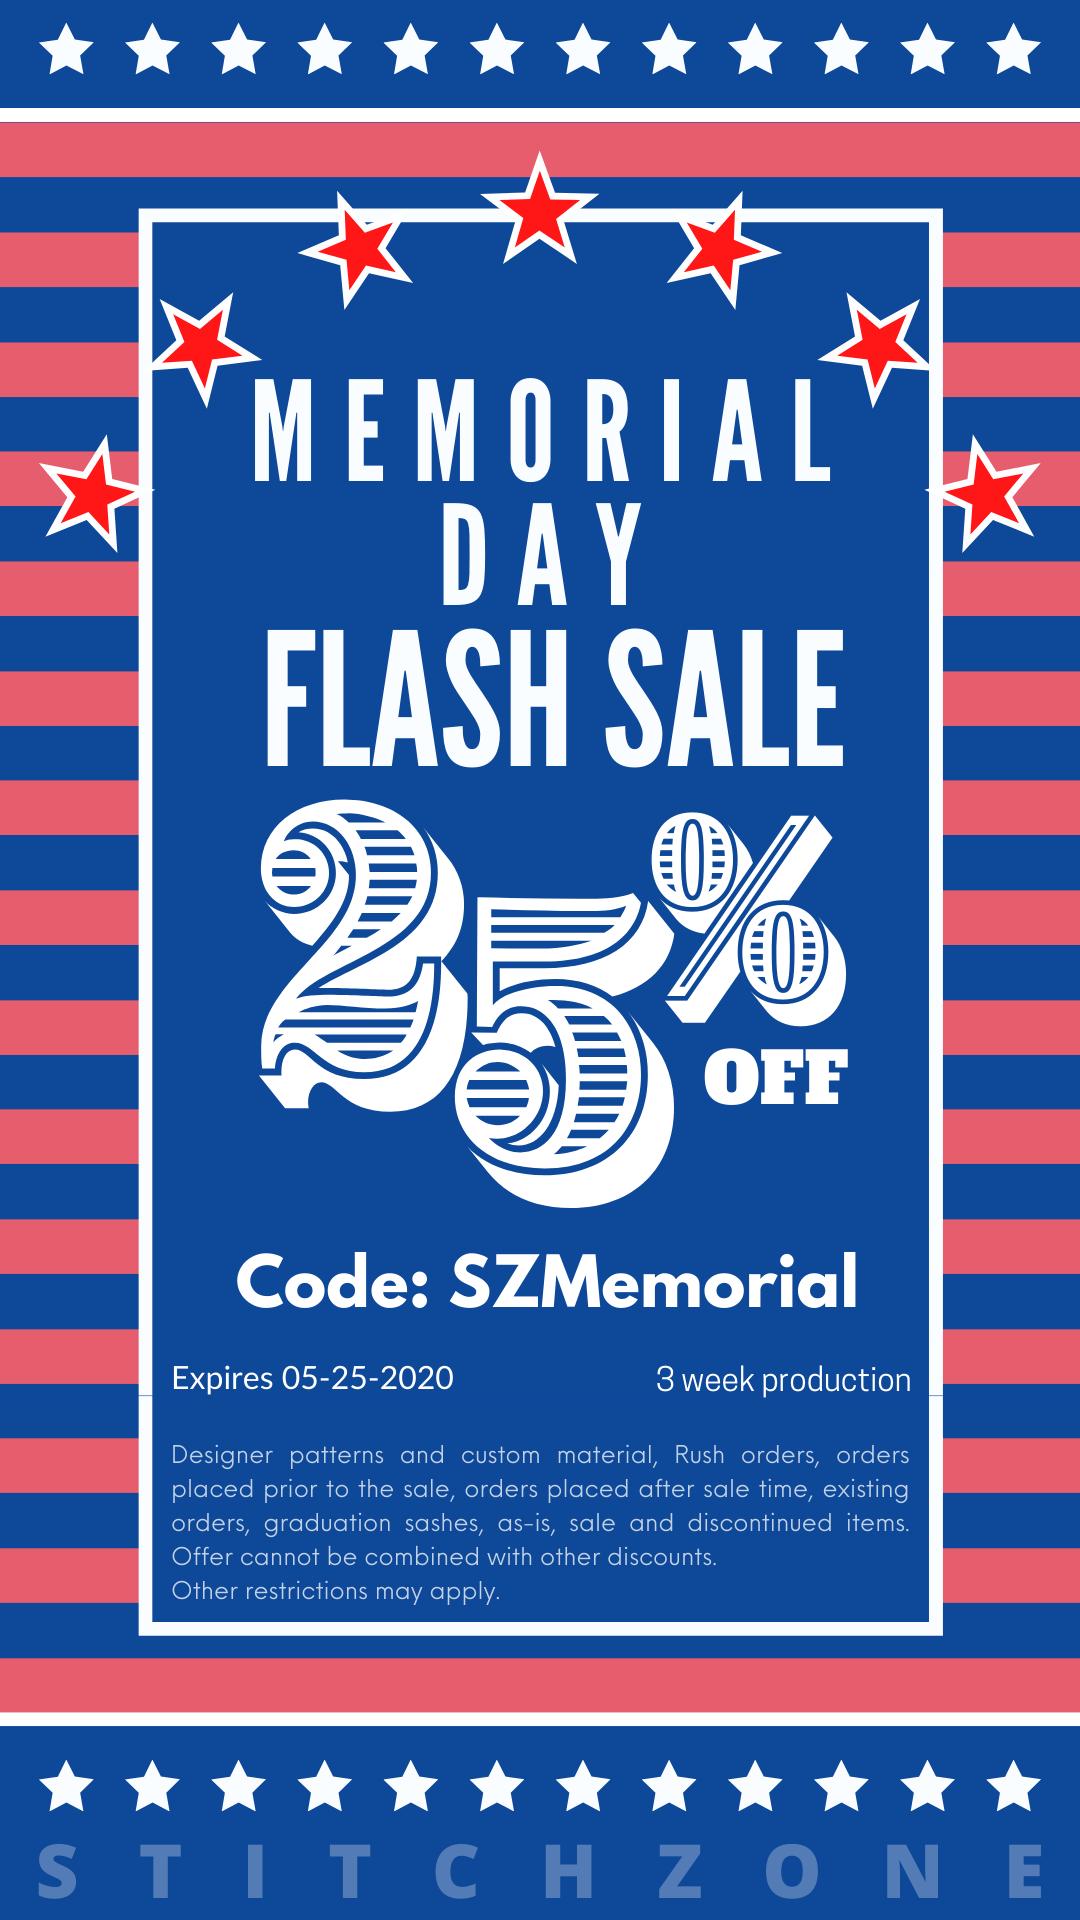 StitchZone Memorial Day Sale